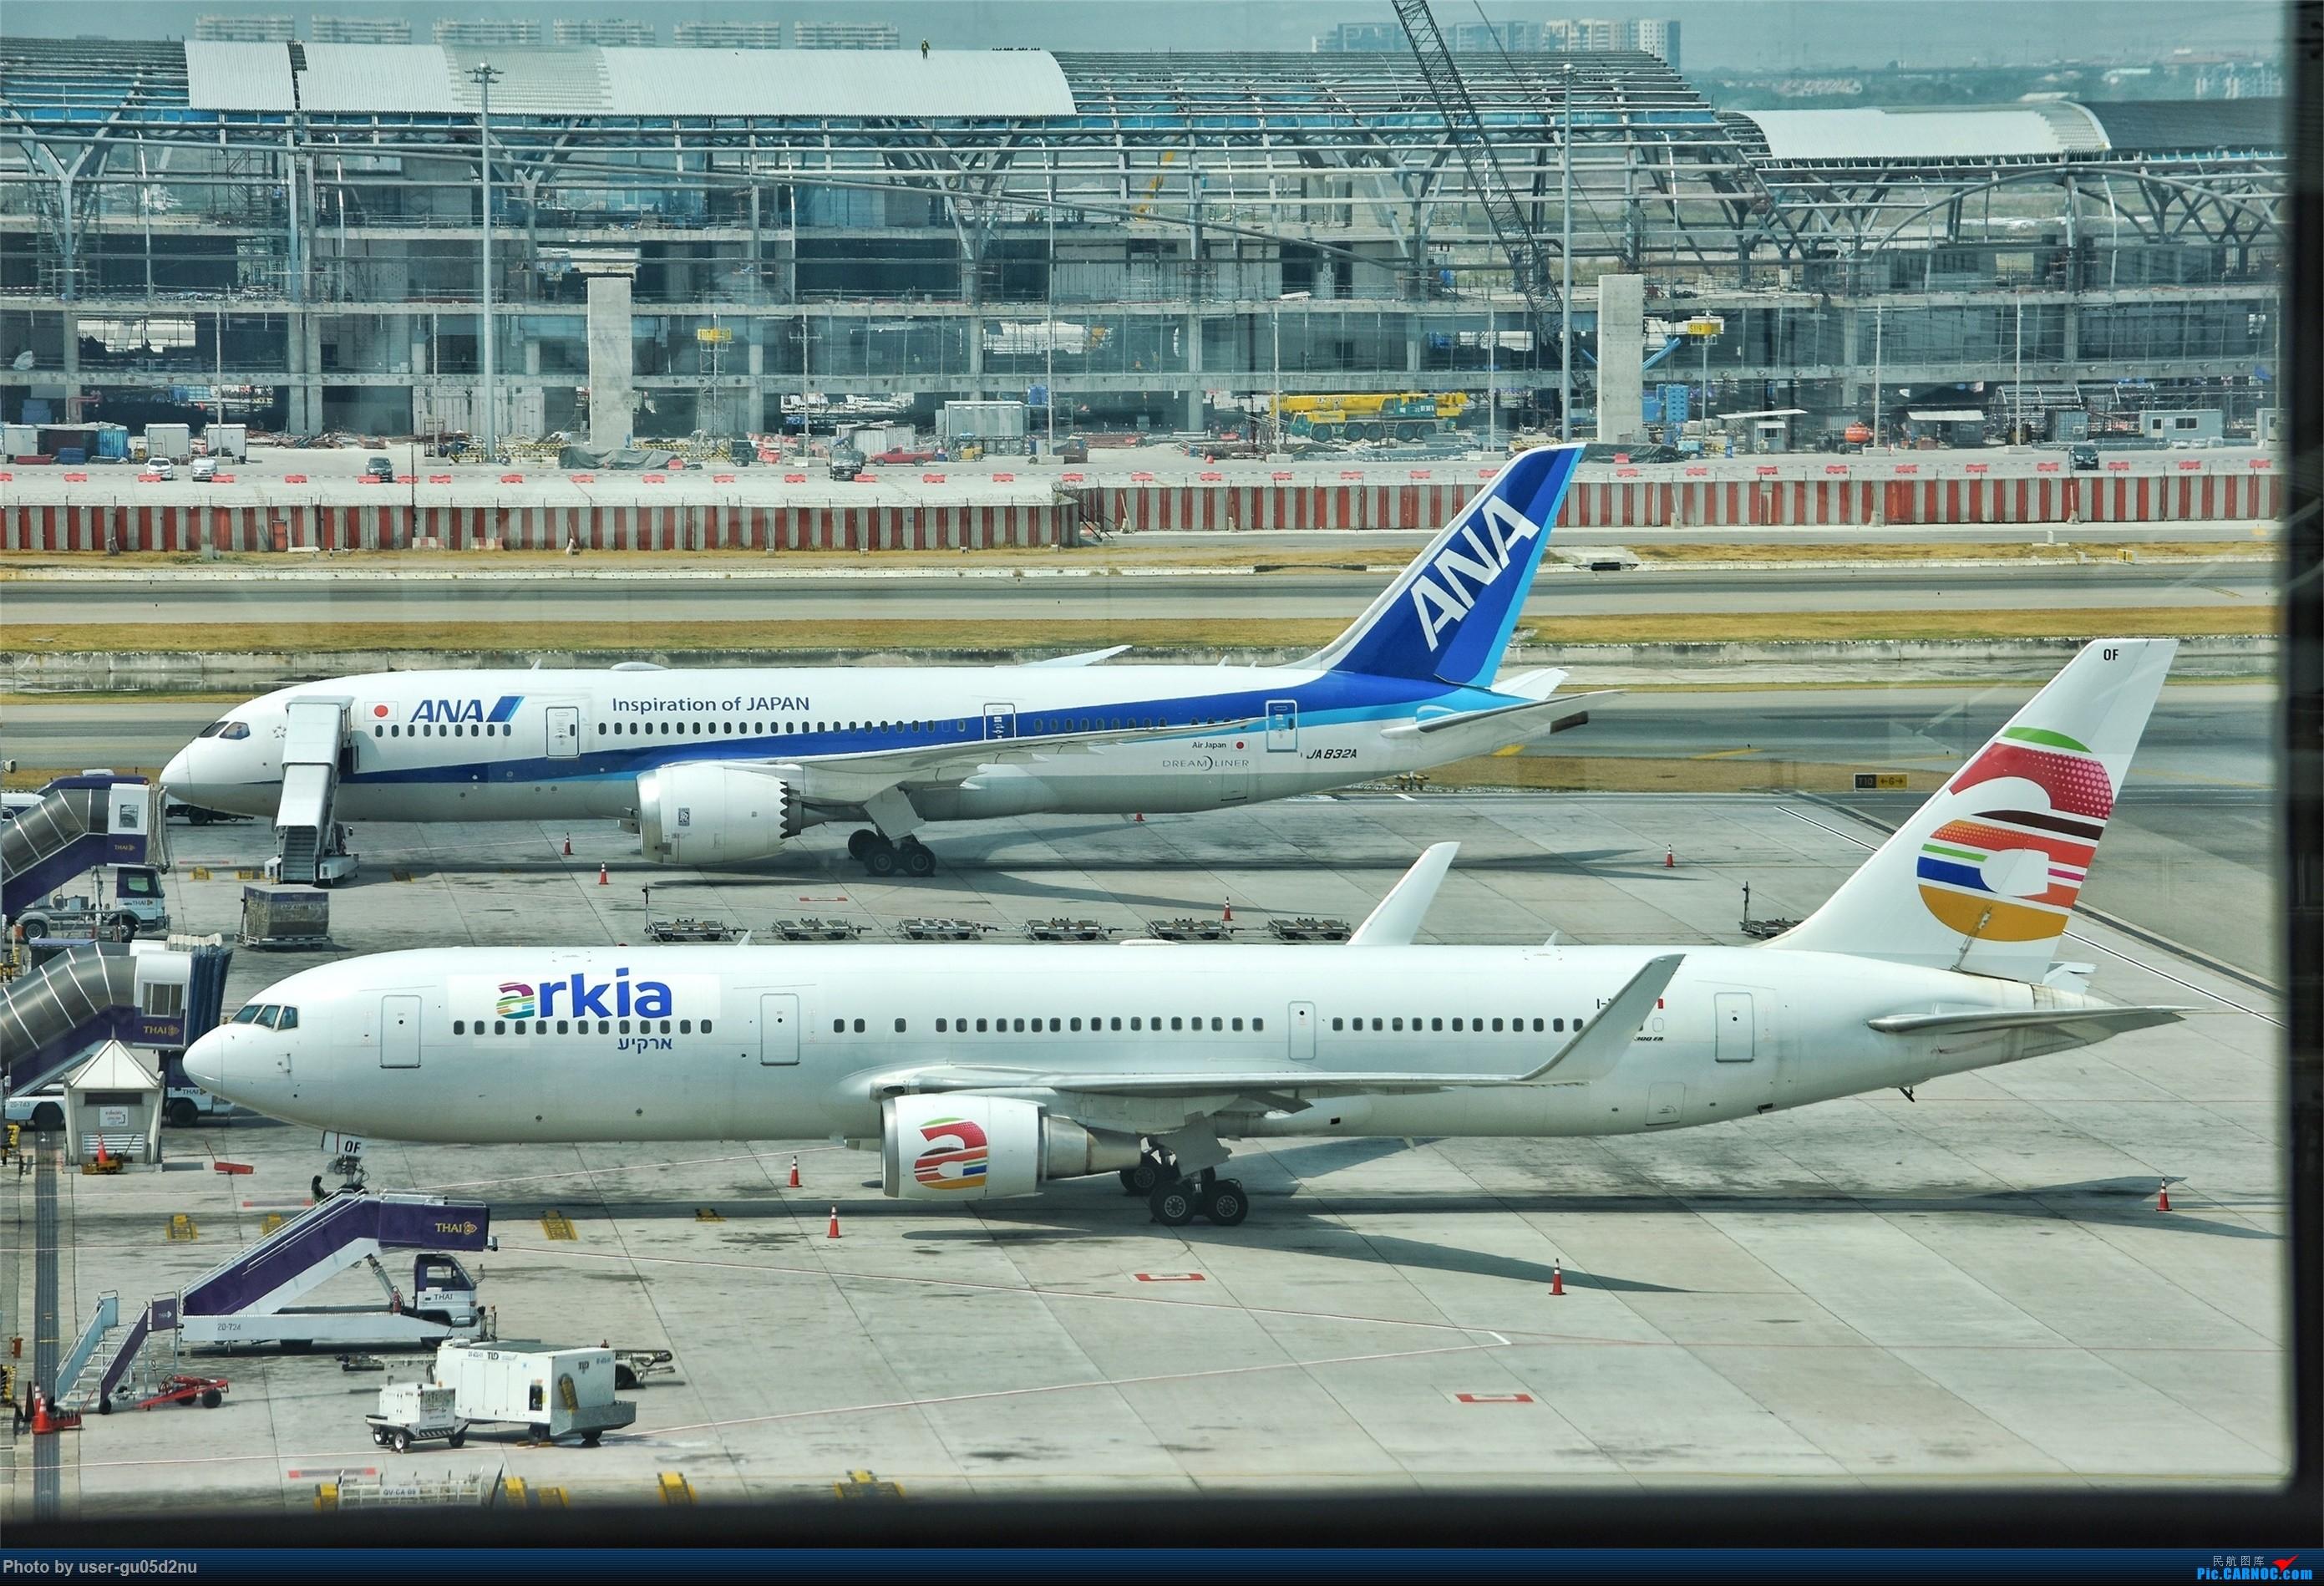 [原创]曼谷素万那普观景平台视角【滑行篇】 BOEING 767-300ER I-NDOF Suvarnabhumi Airport